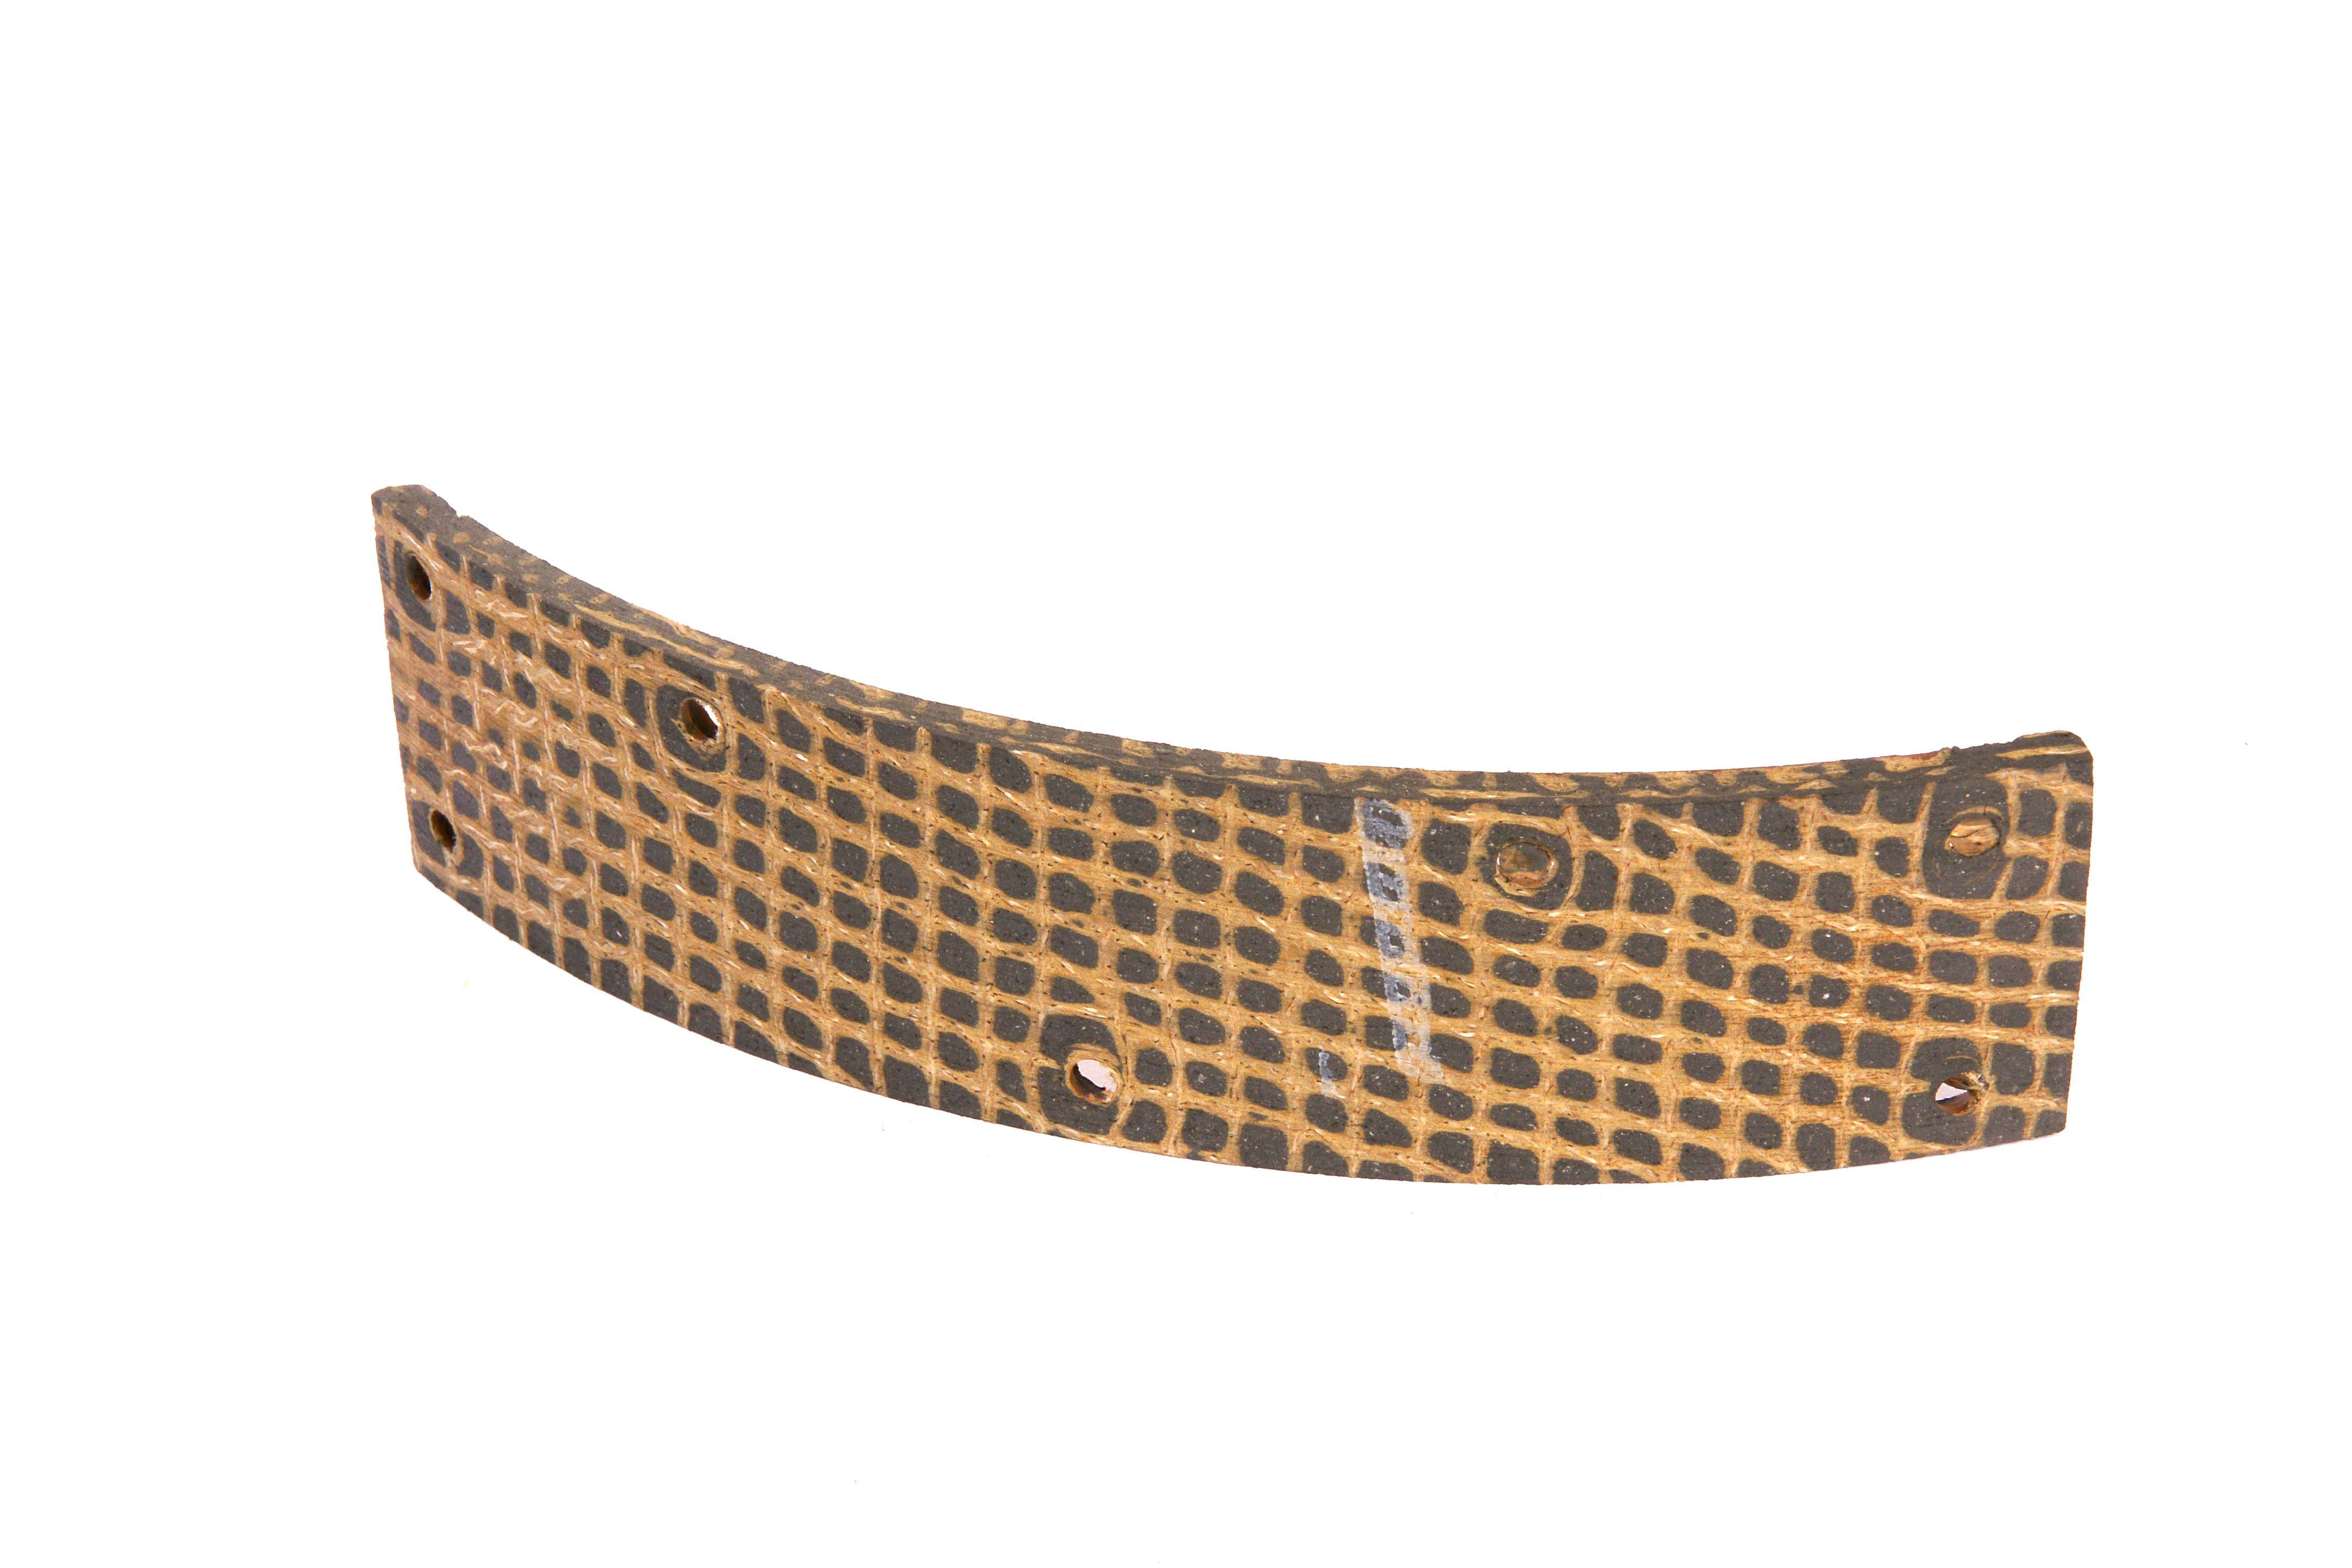 MASSEY FERGUSON CRAWLER BRAKE LINING (AGCO) 1423488M1